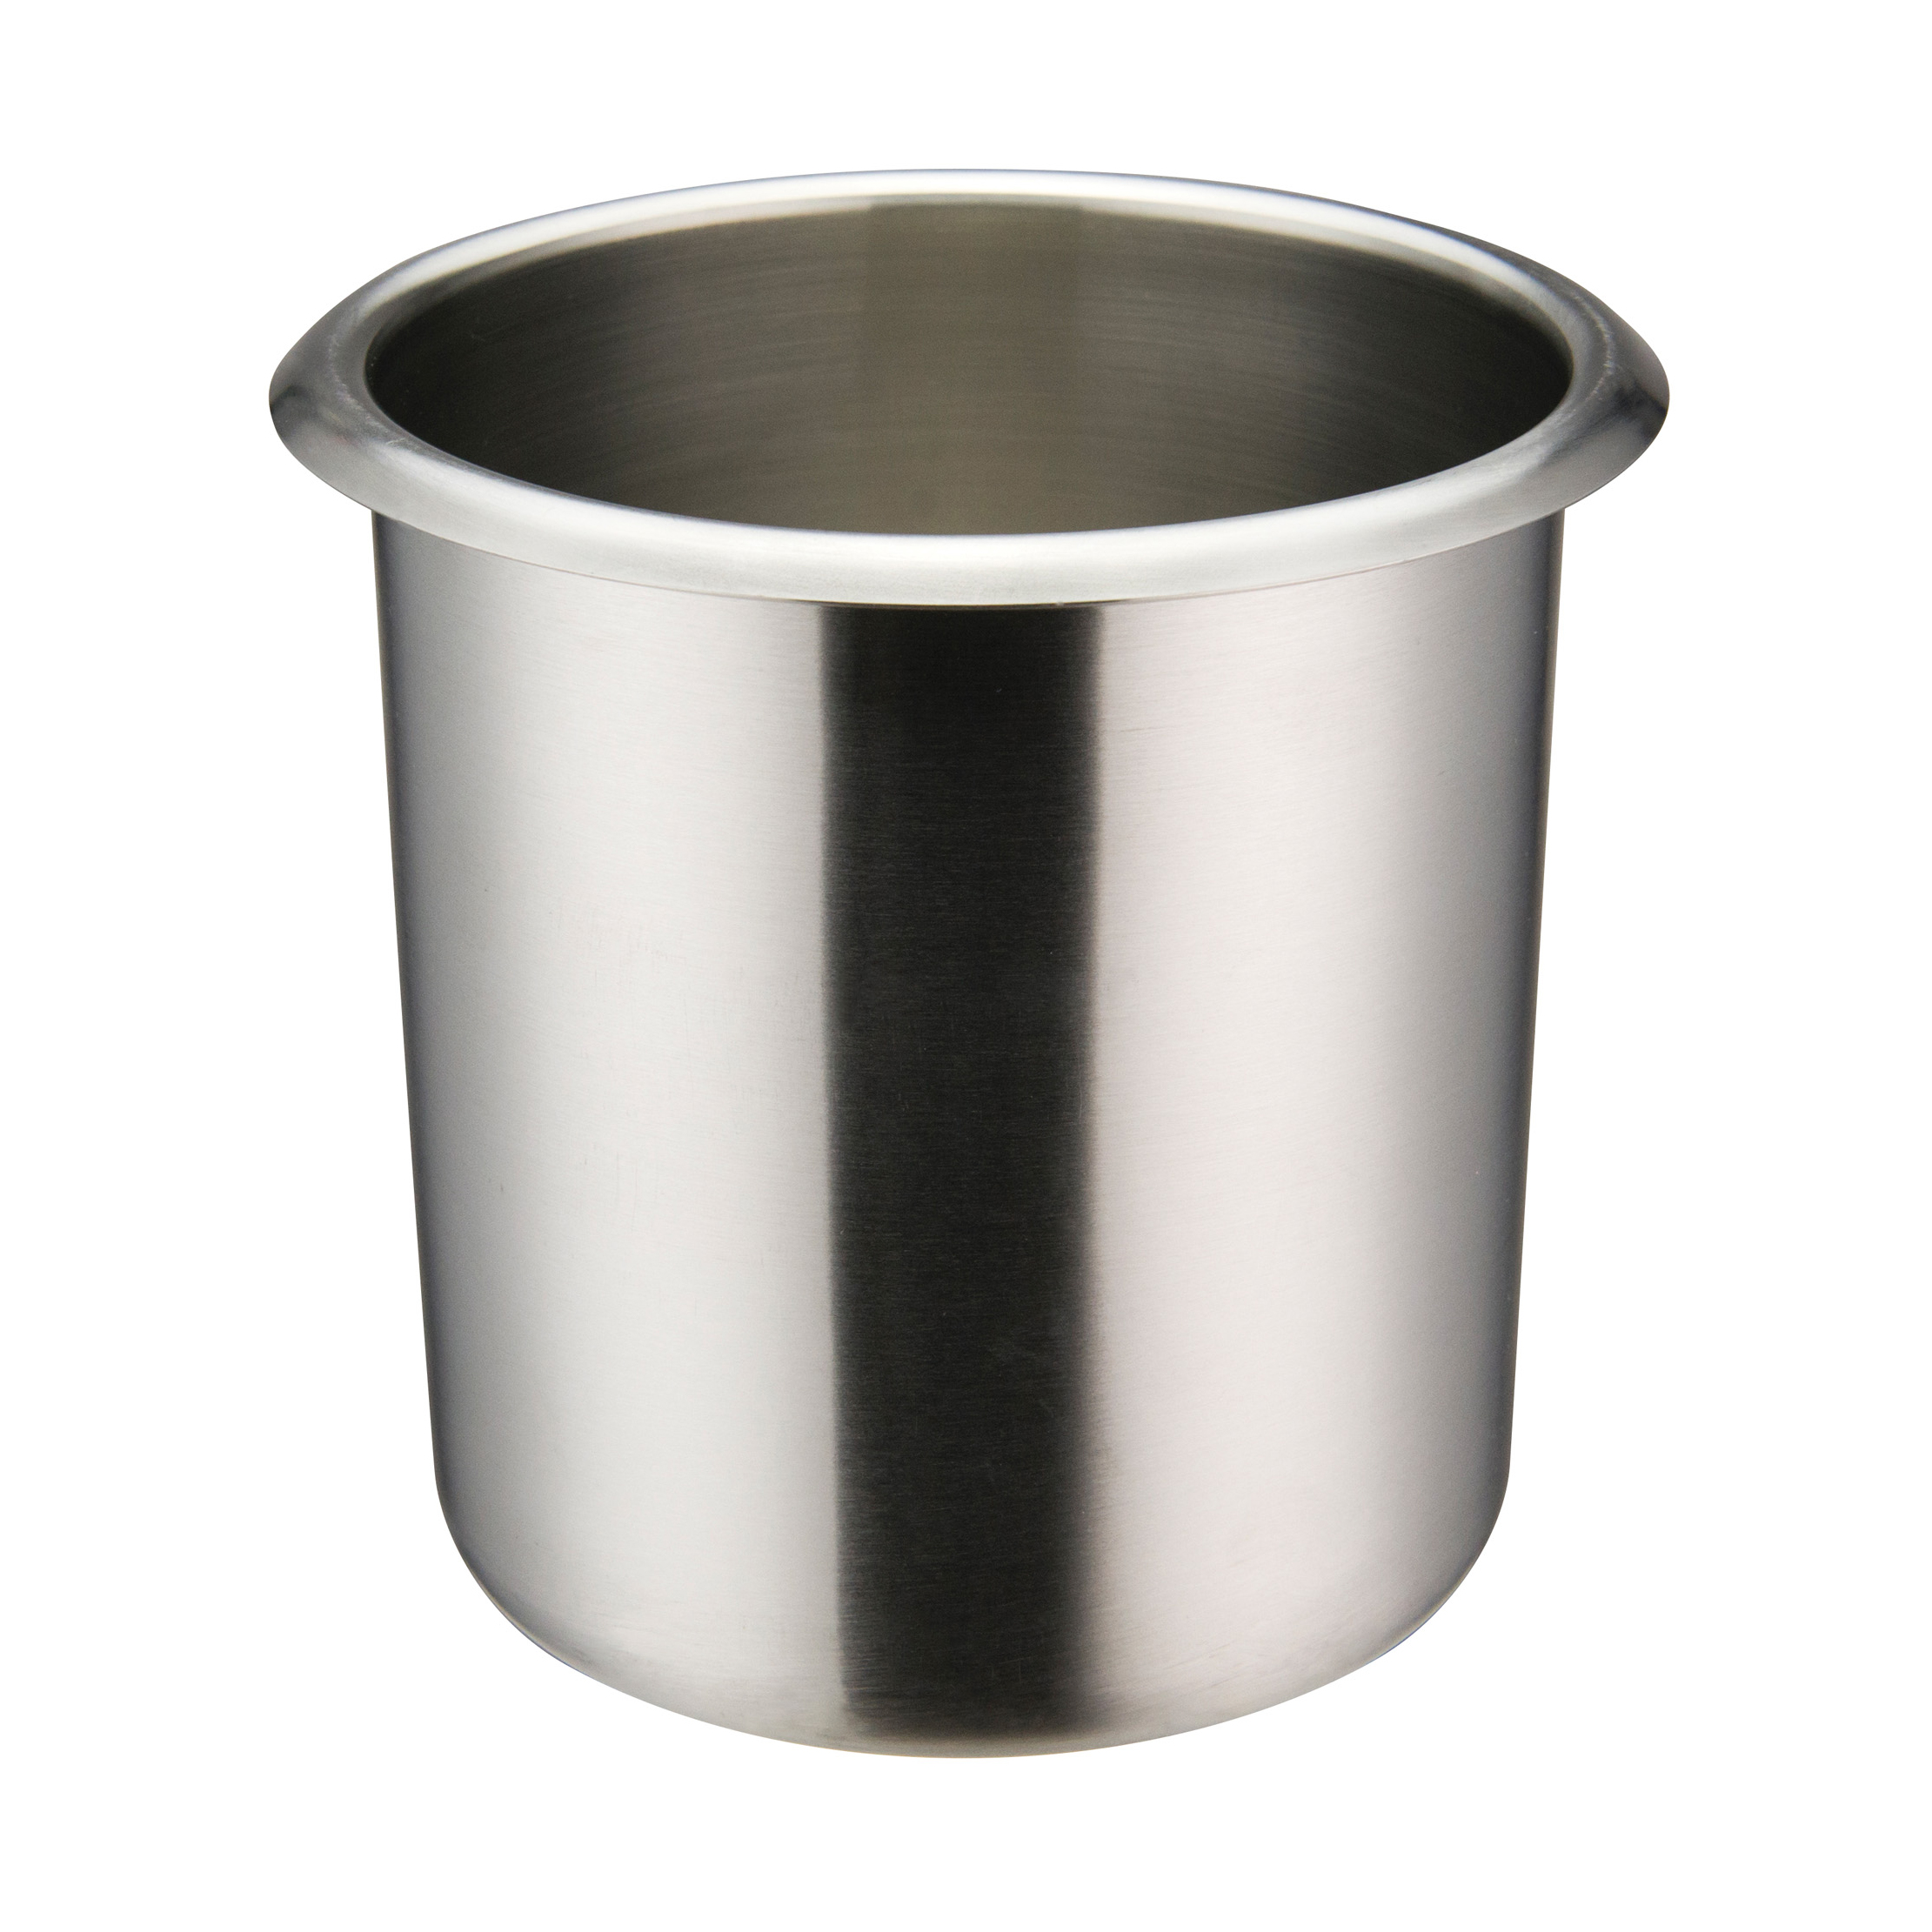 Winco BAM-1.5 bain marie pot